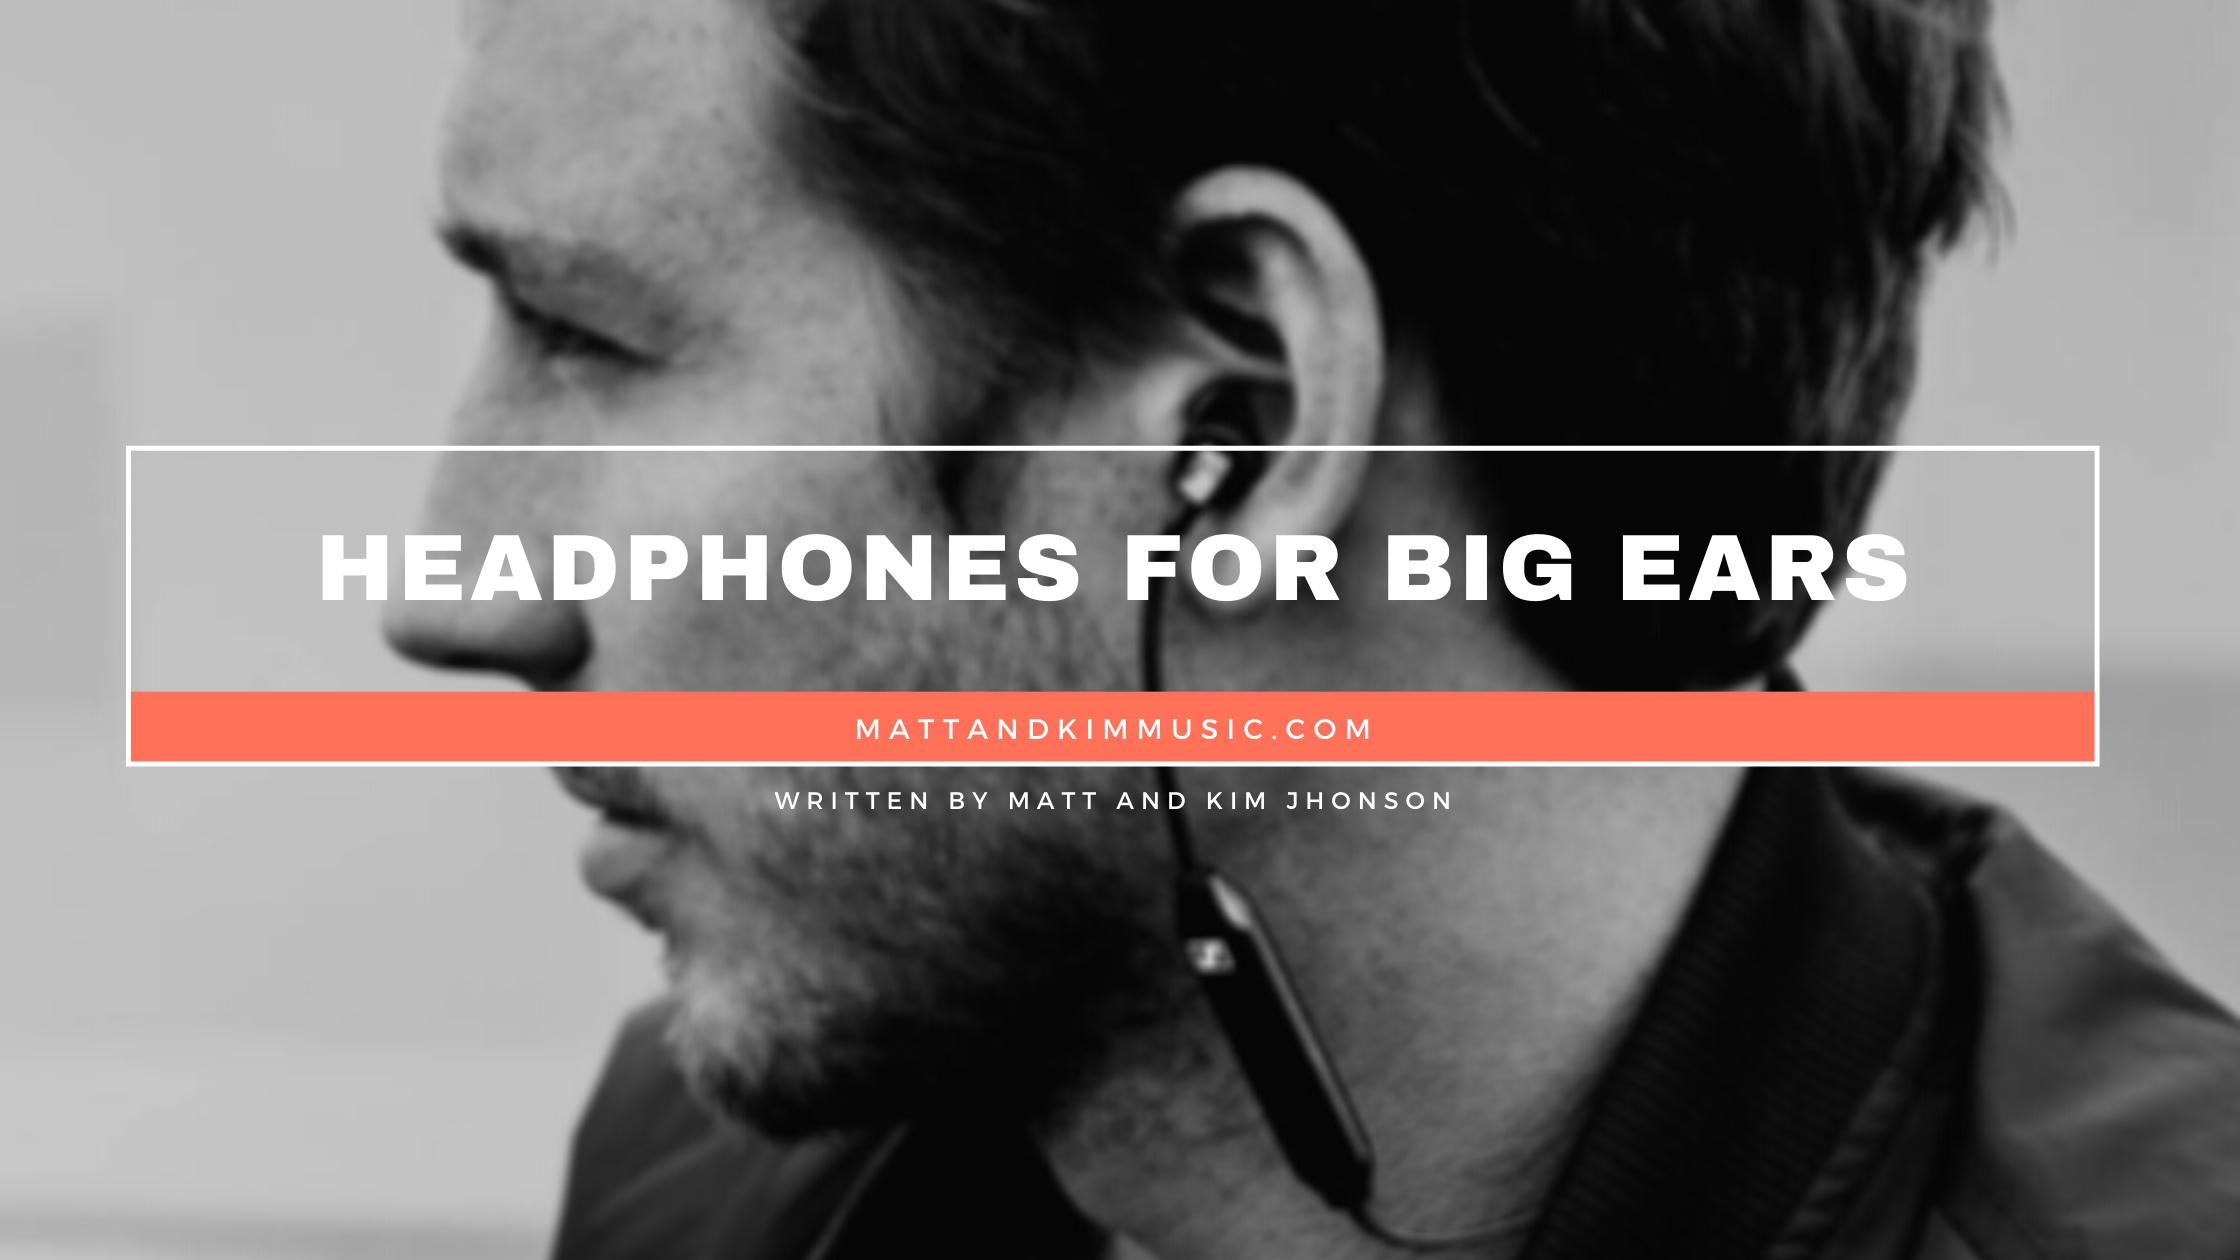 Headphones For Big Ears